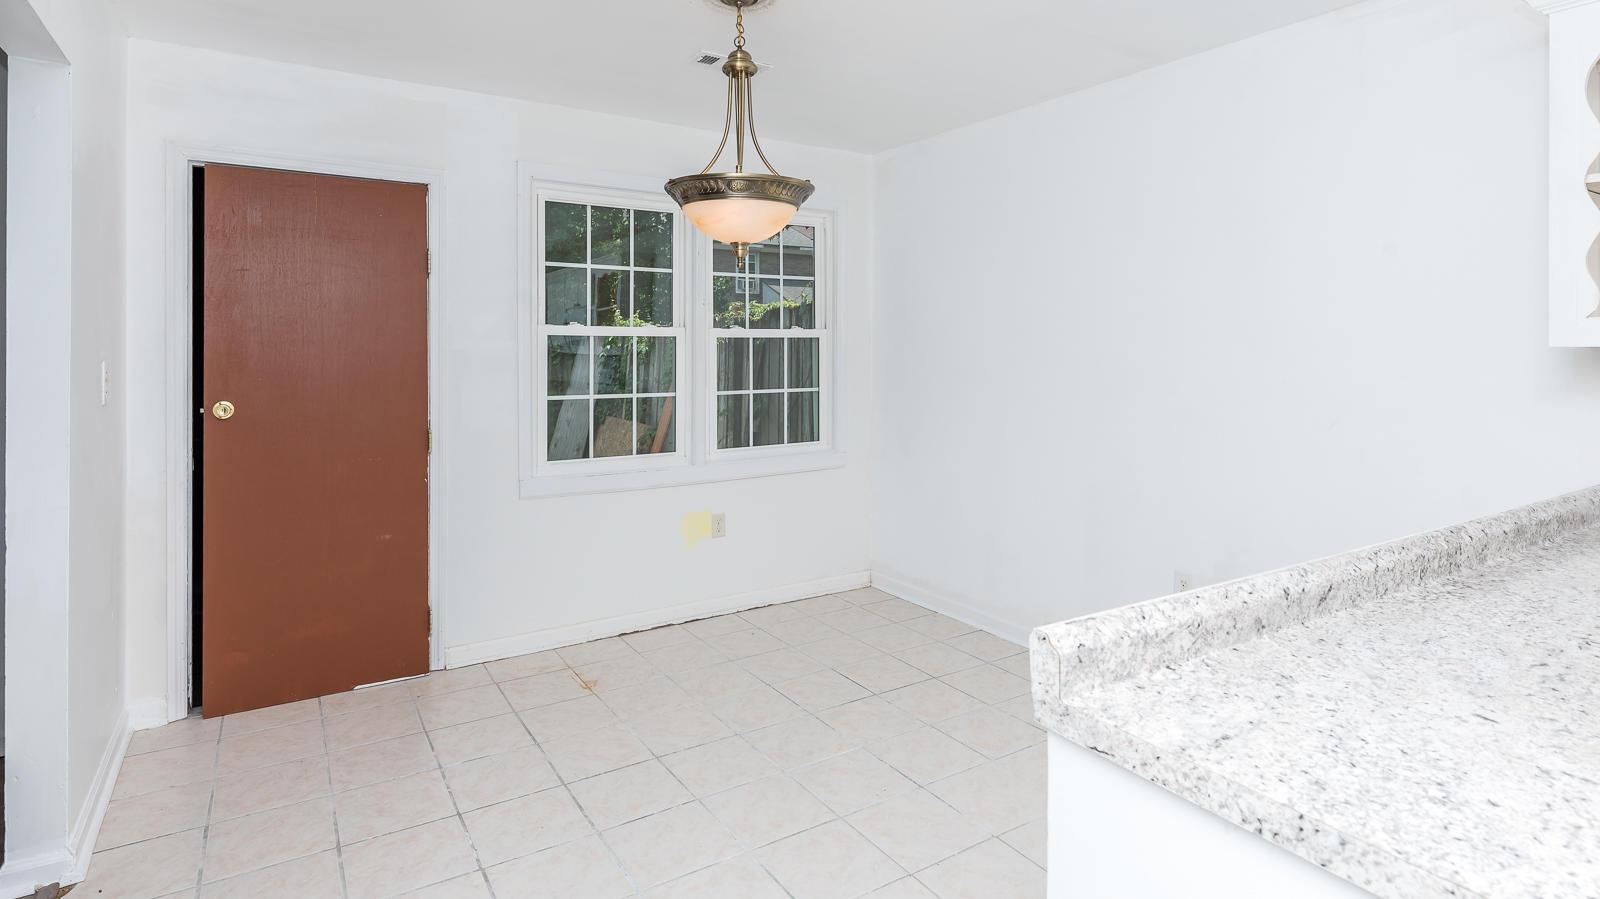 Ashley Villas Homes For Sale - 4315 Briarstone, North Charleston, SC - 20